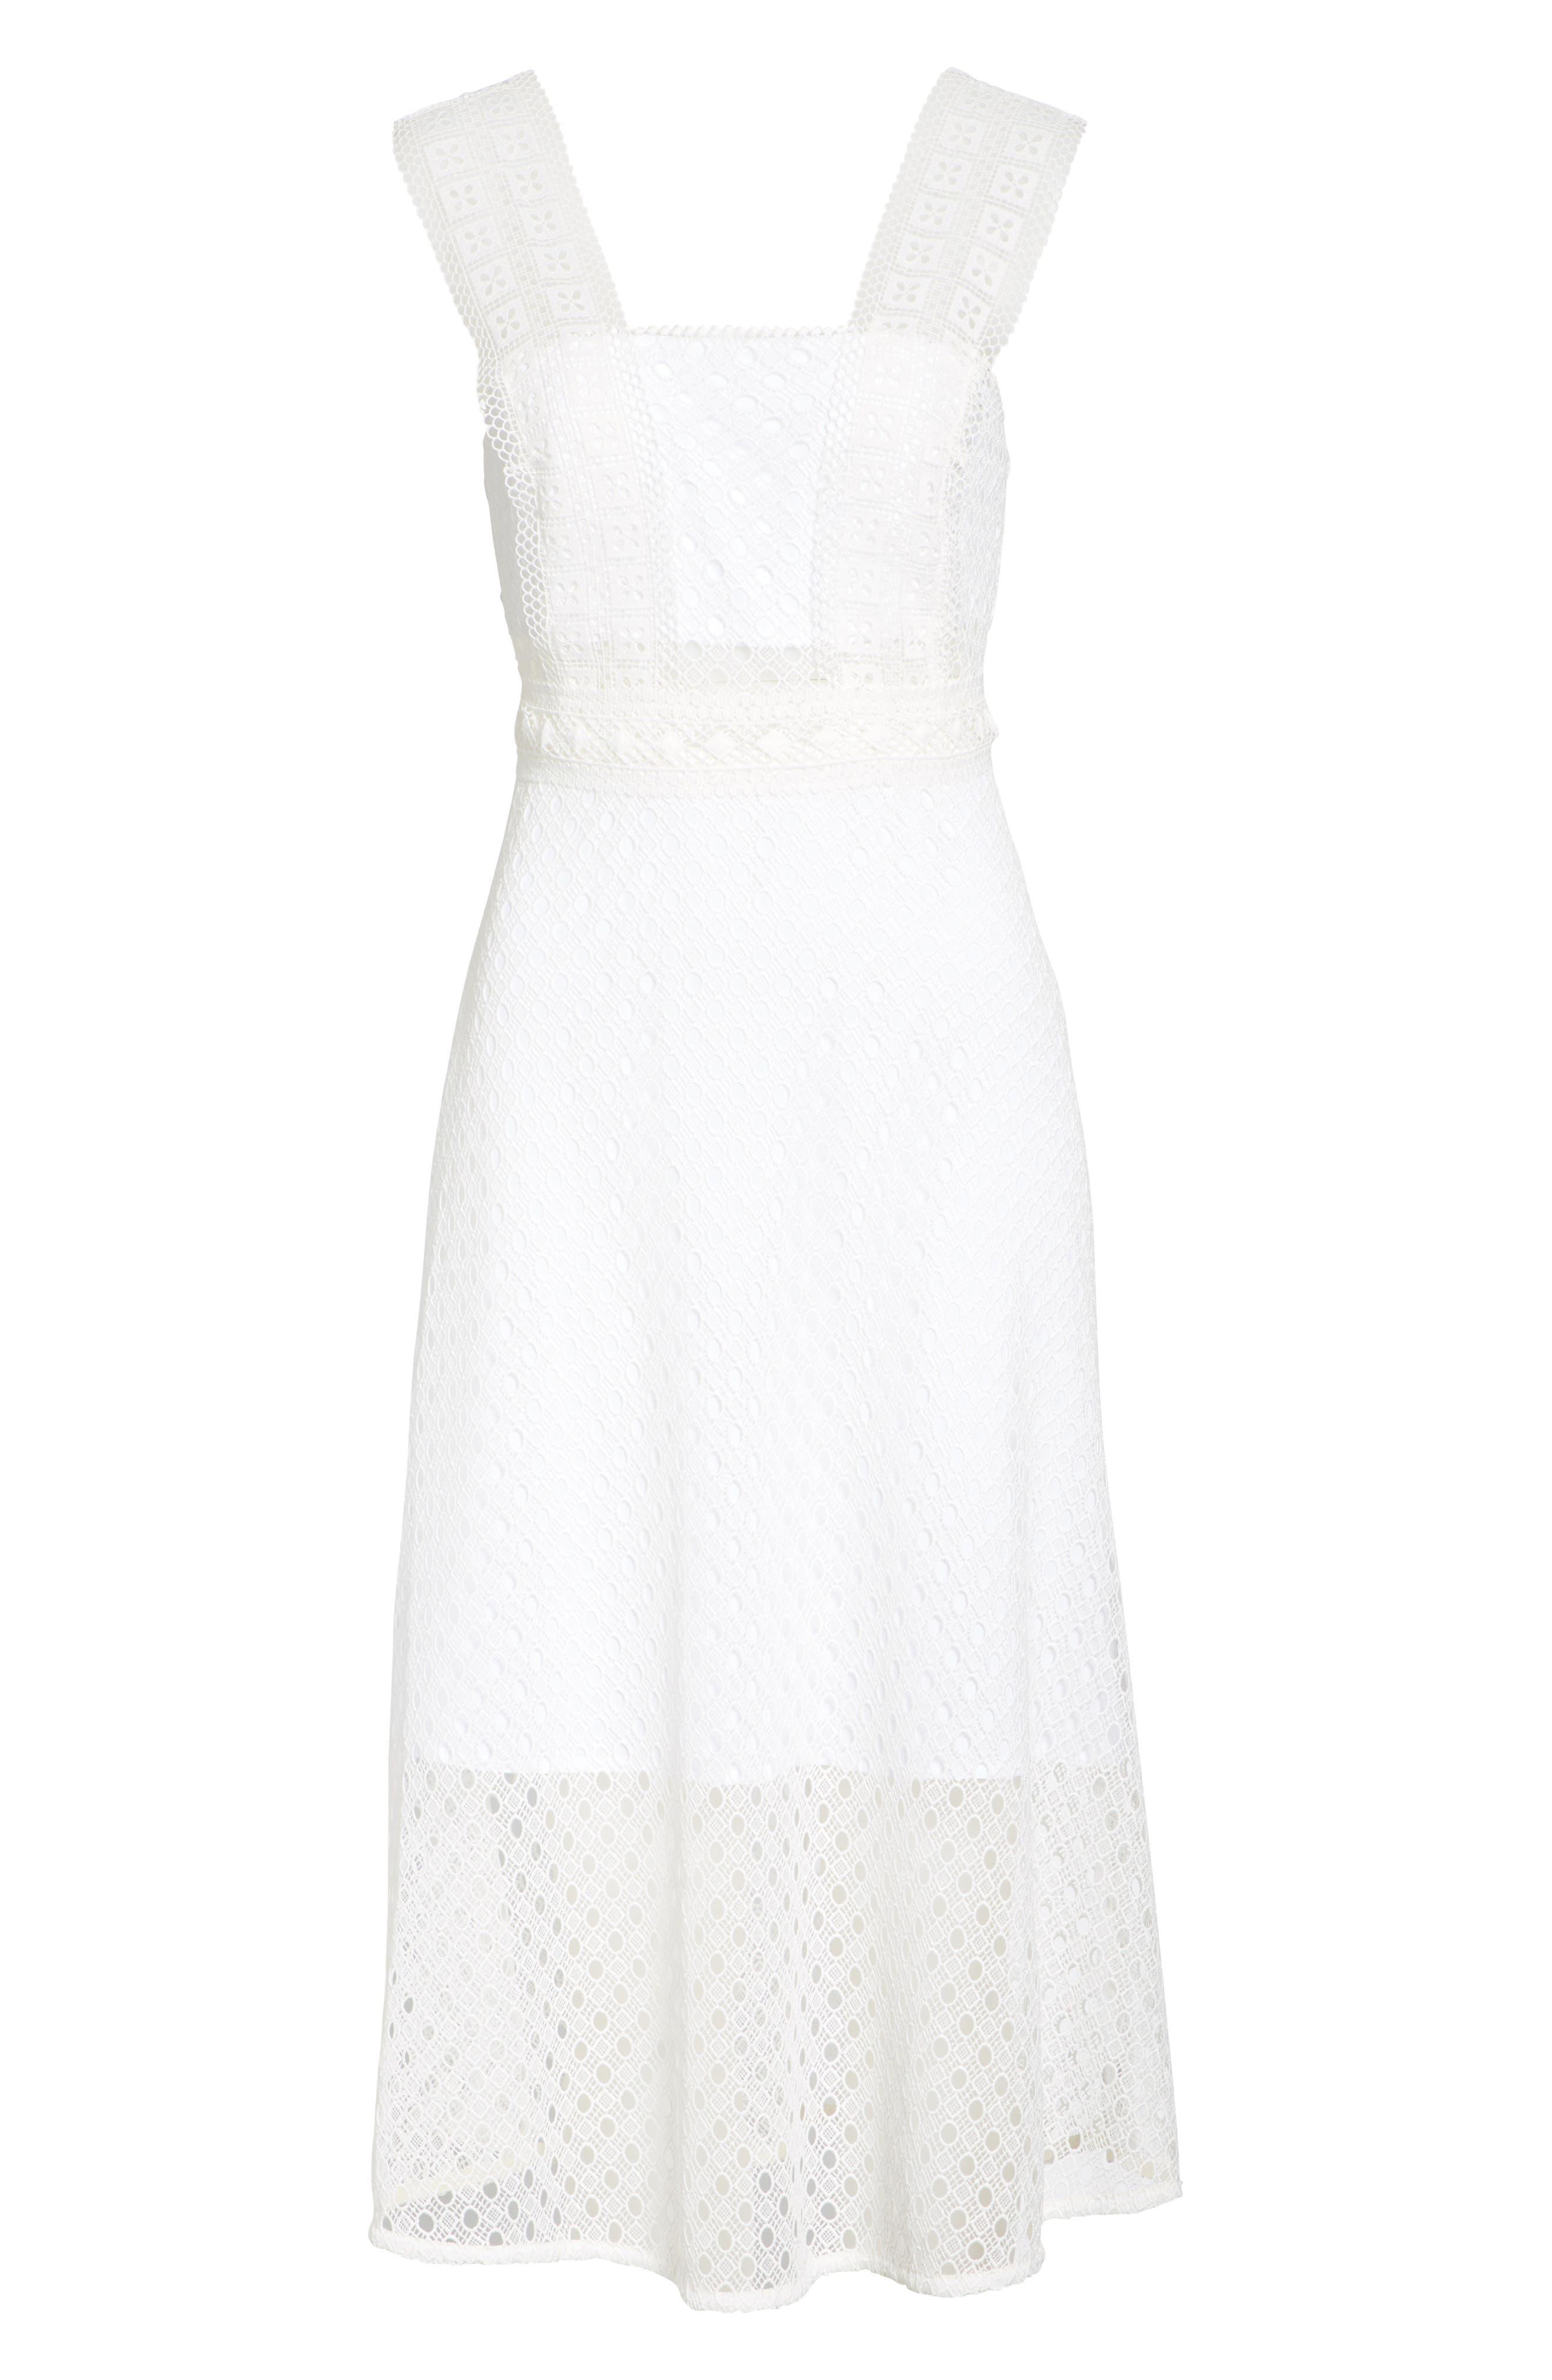 Blanc Lace Square Neck Dress,                             Alternate thumbnail 6, color,                             100